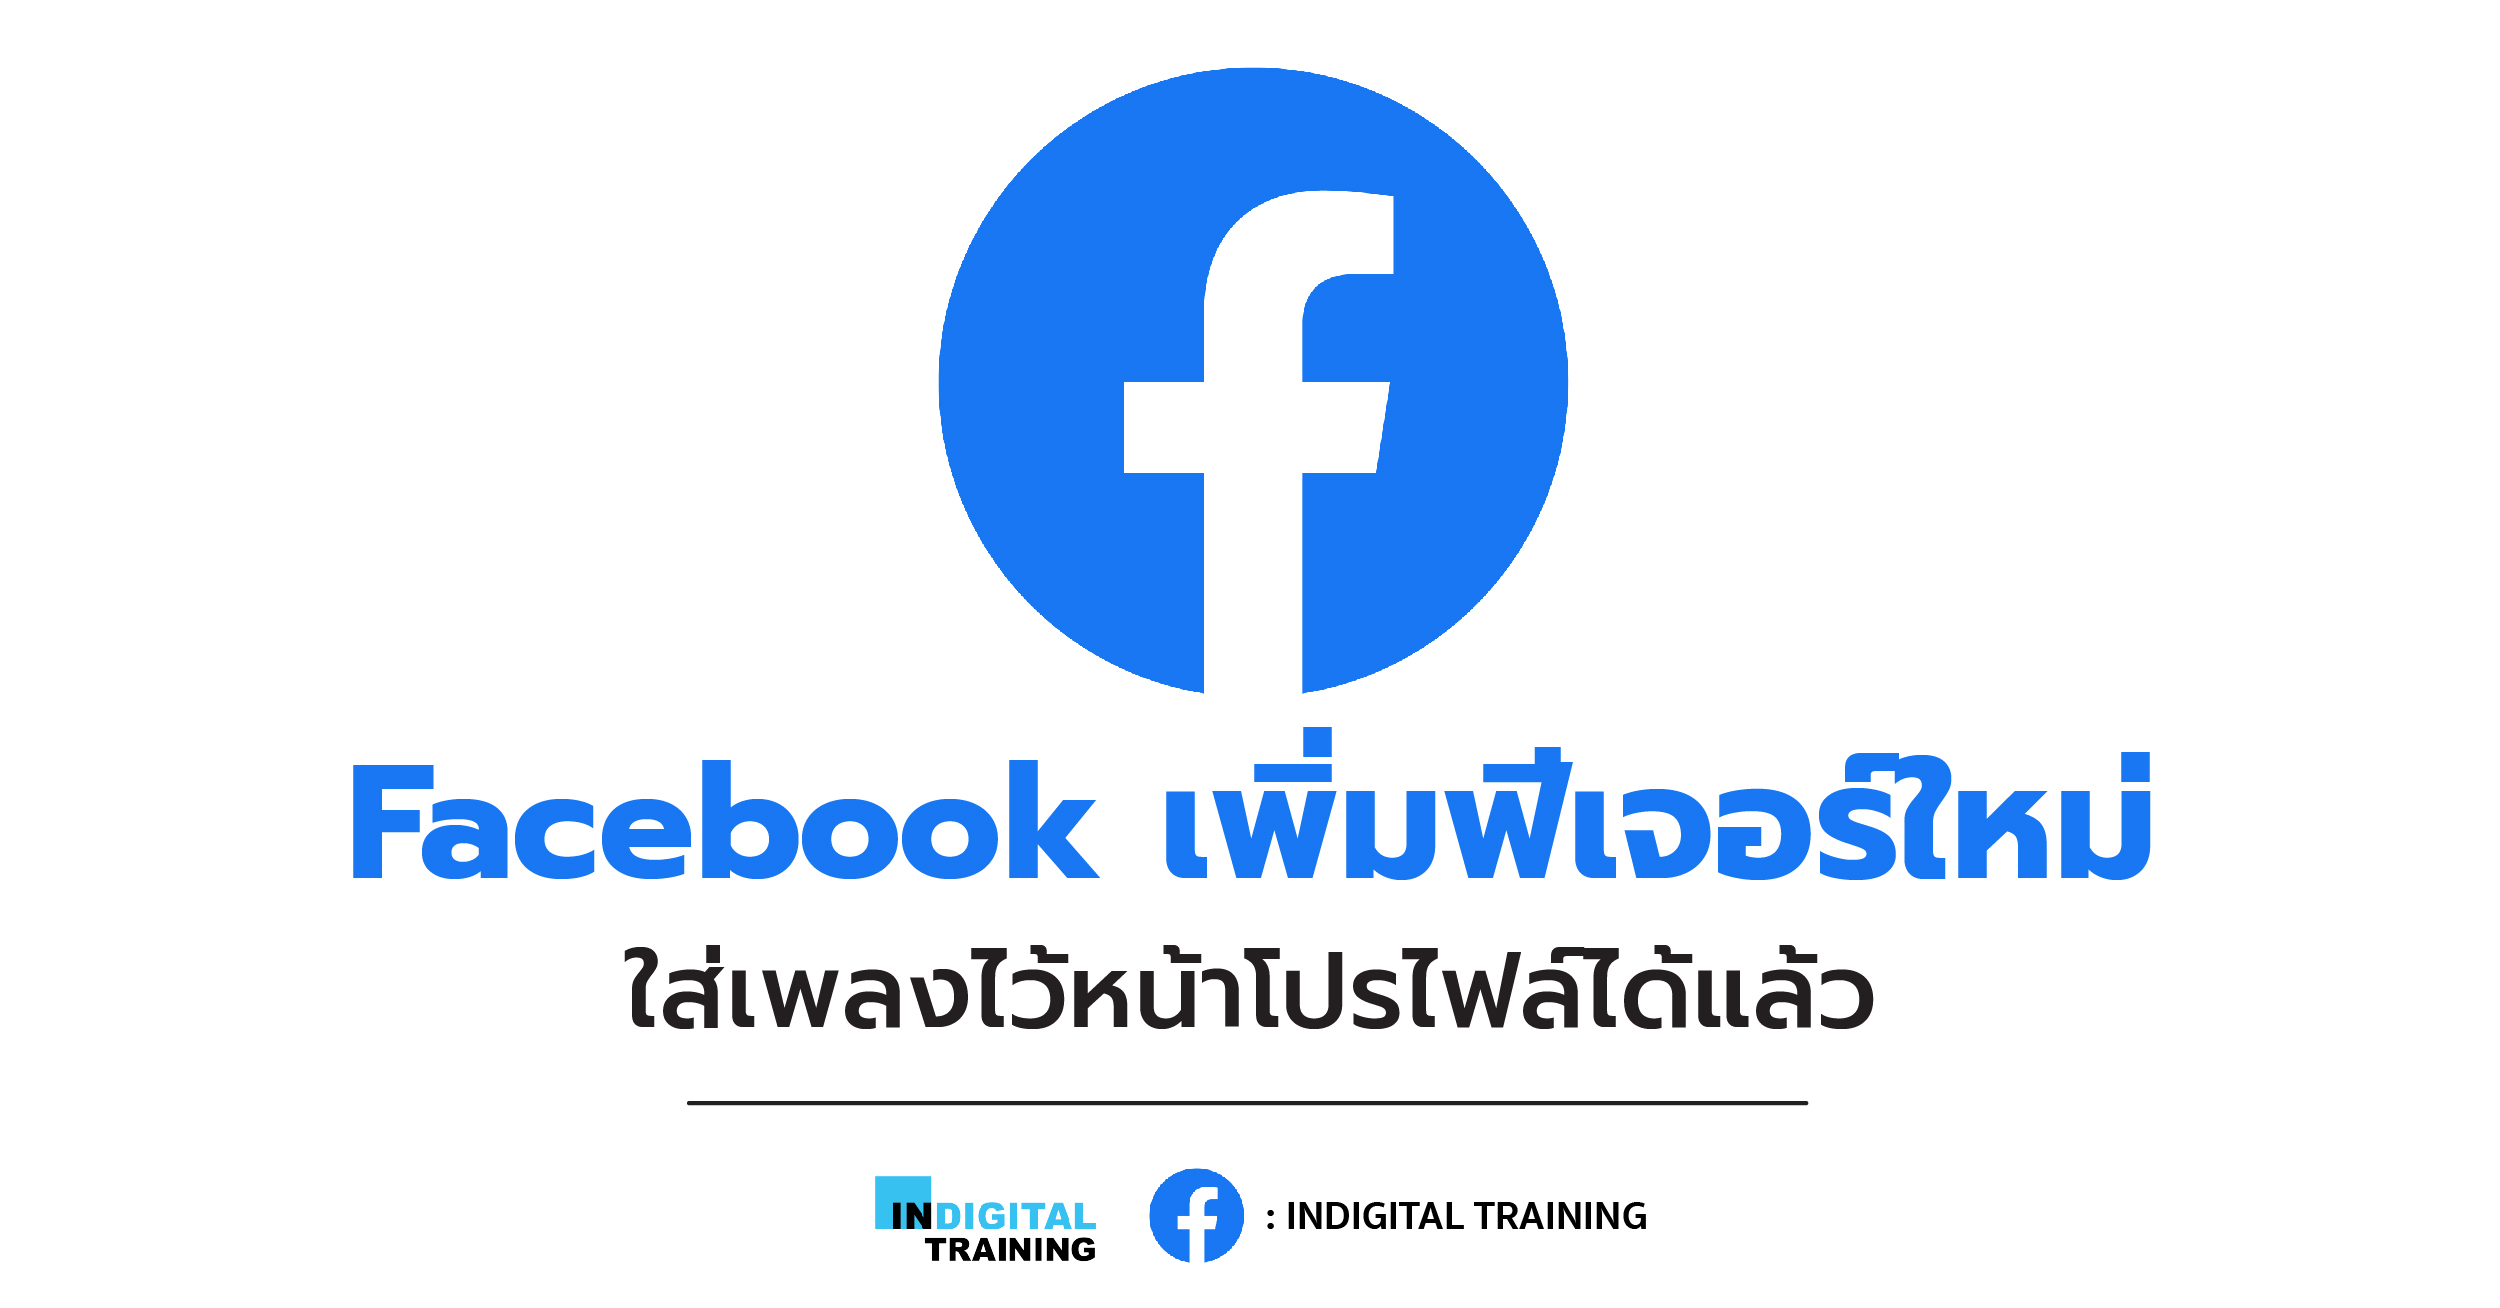 Facebook เพิ่มฟีเจอร์ใหม่ ใส่เพลงไว้หน้าโปรไฟล์ได้แล้ว